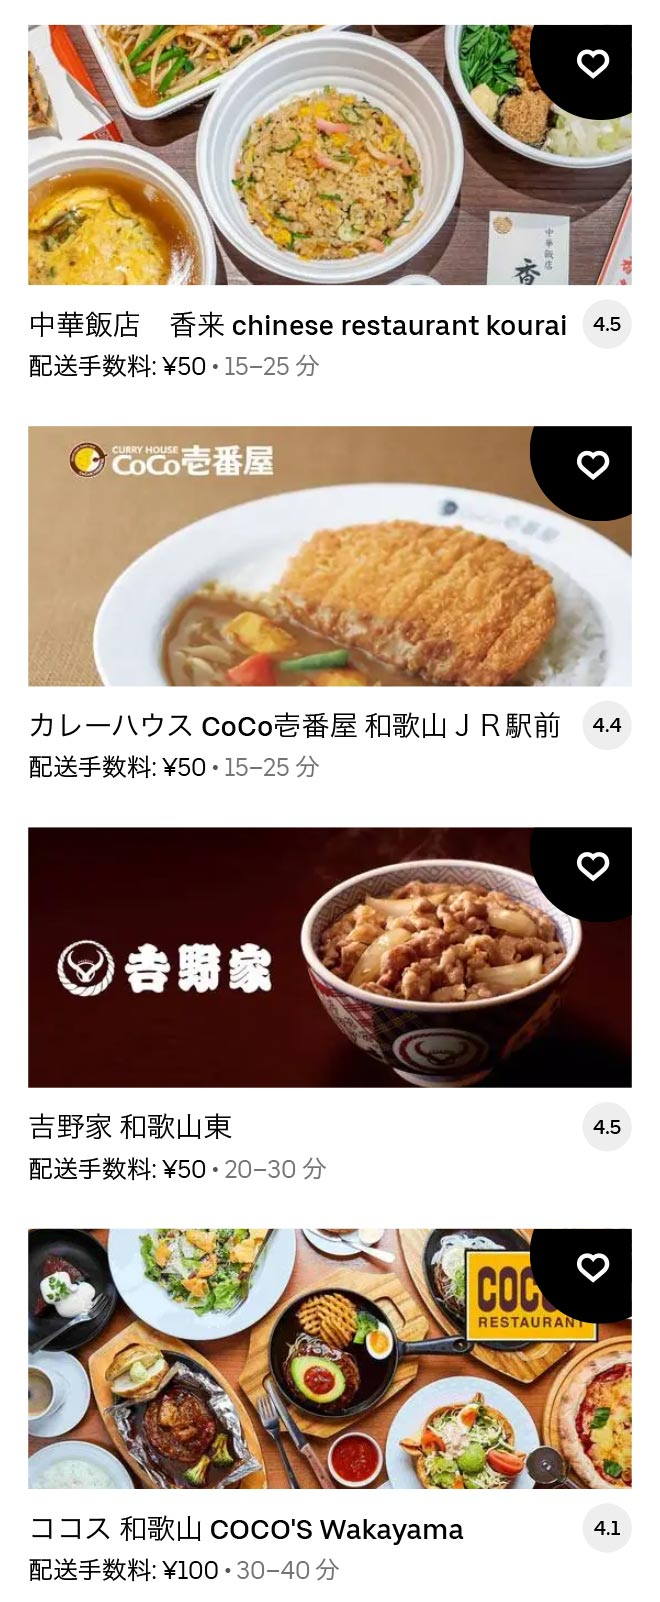 U wakayama menu 2104 07